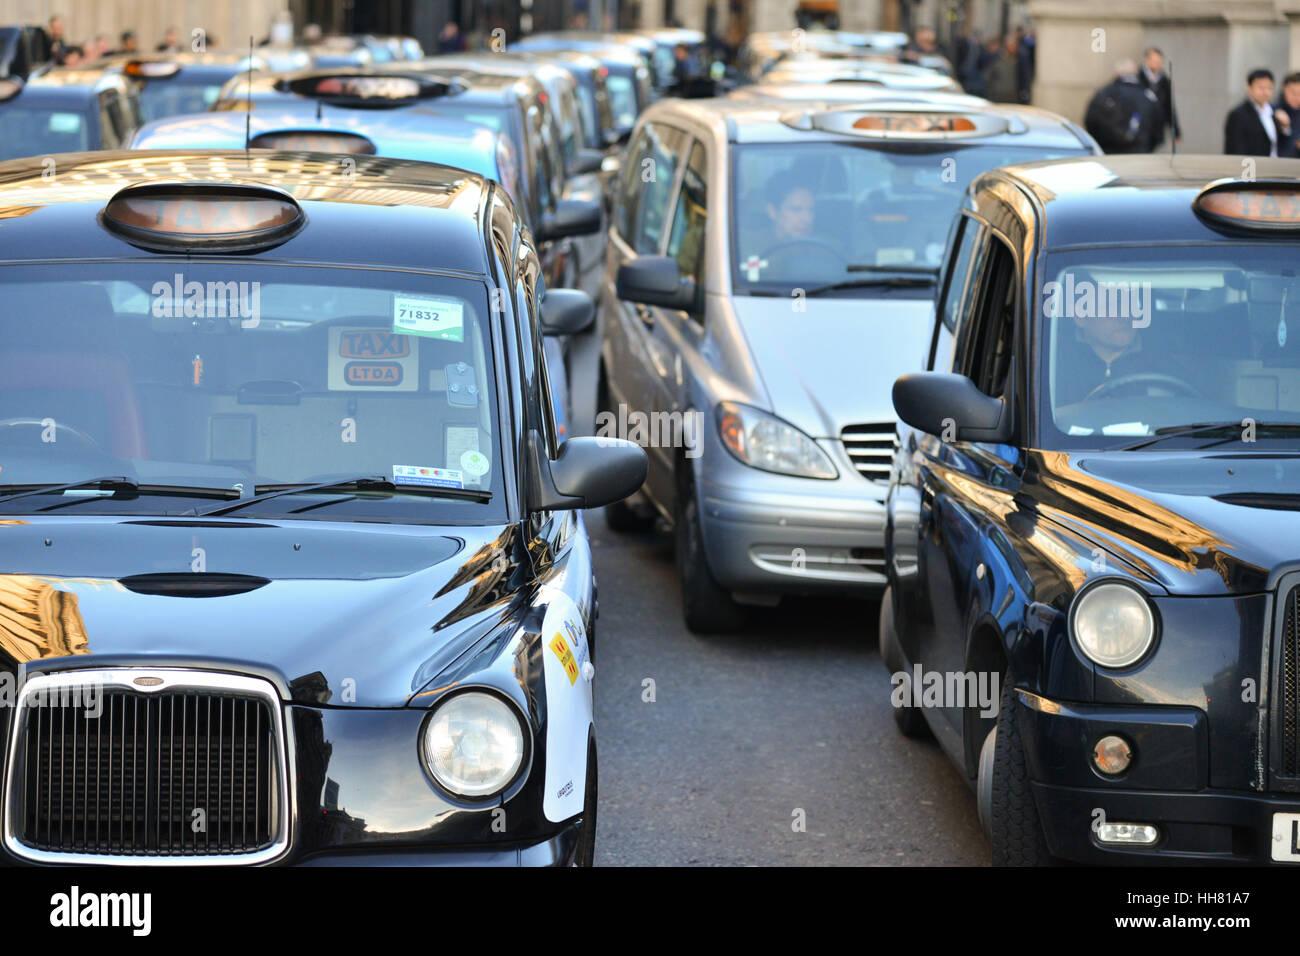 Bank, London, UK. 17. Januar 2017. Schwarzen Taxifahrer inszenieren ...